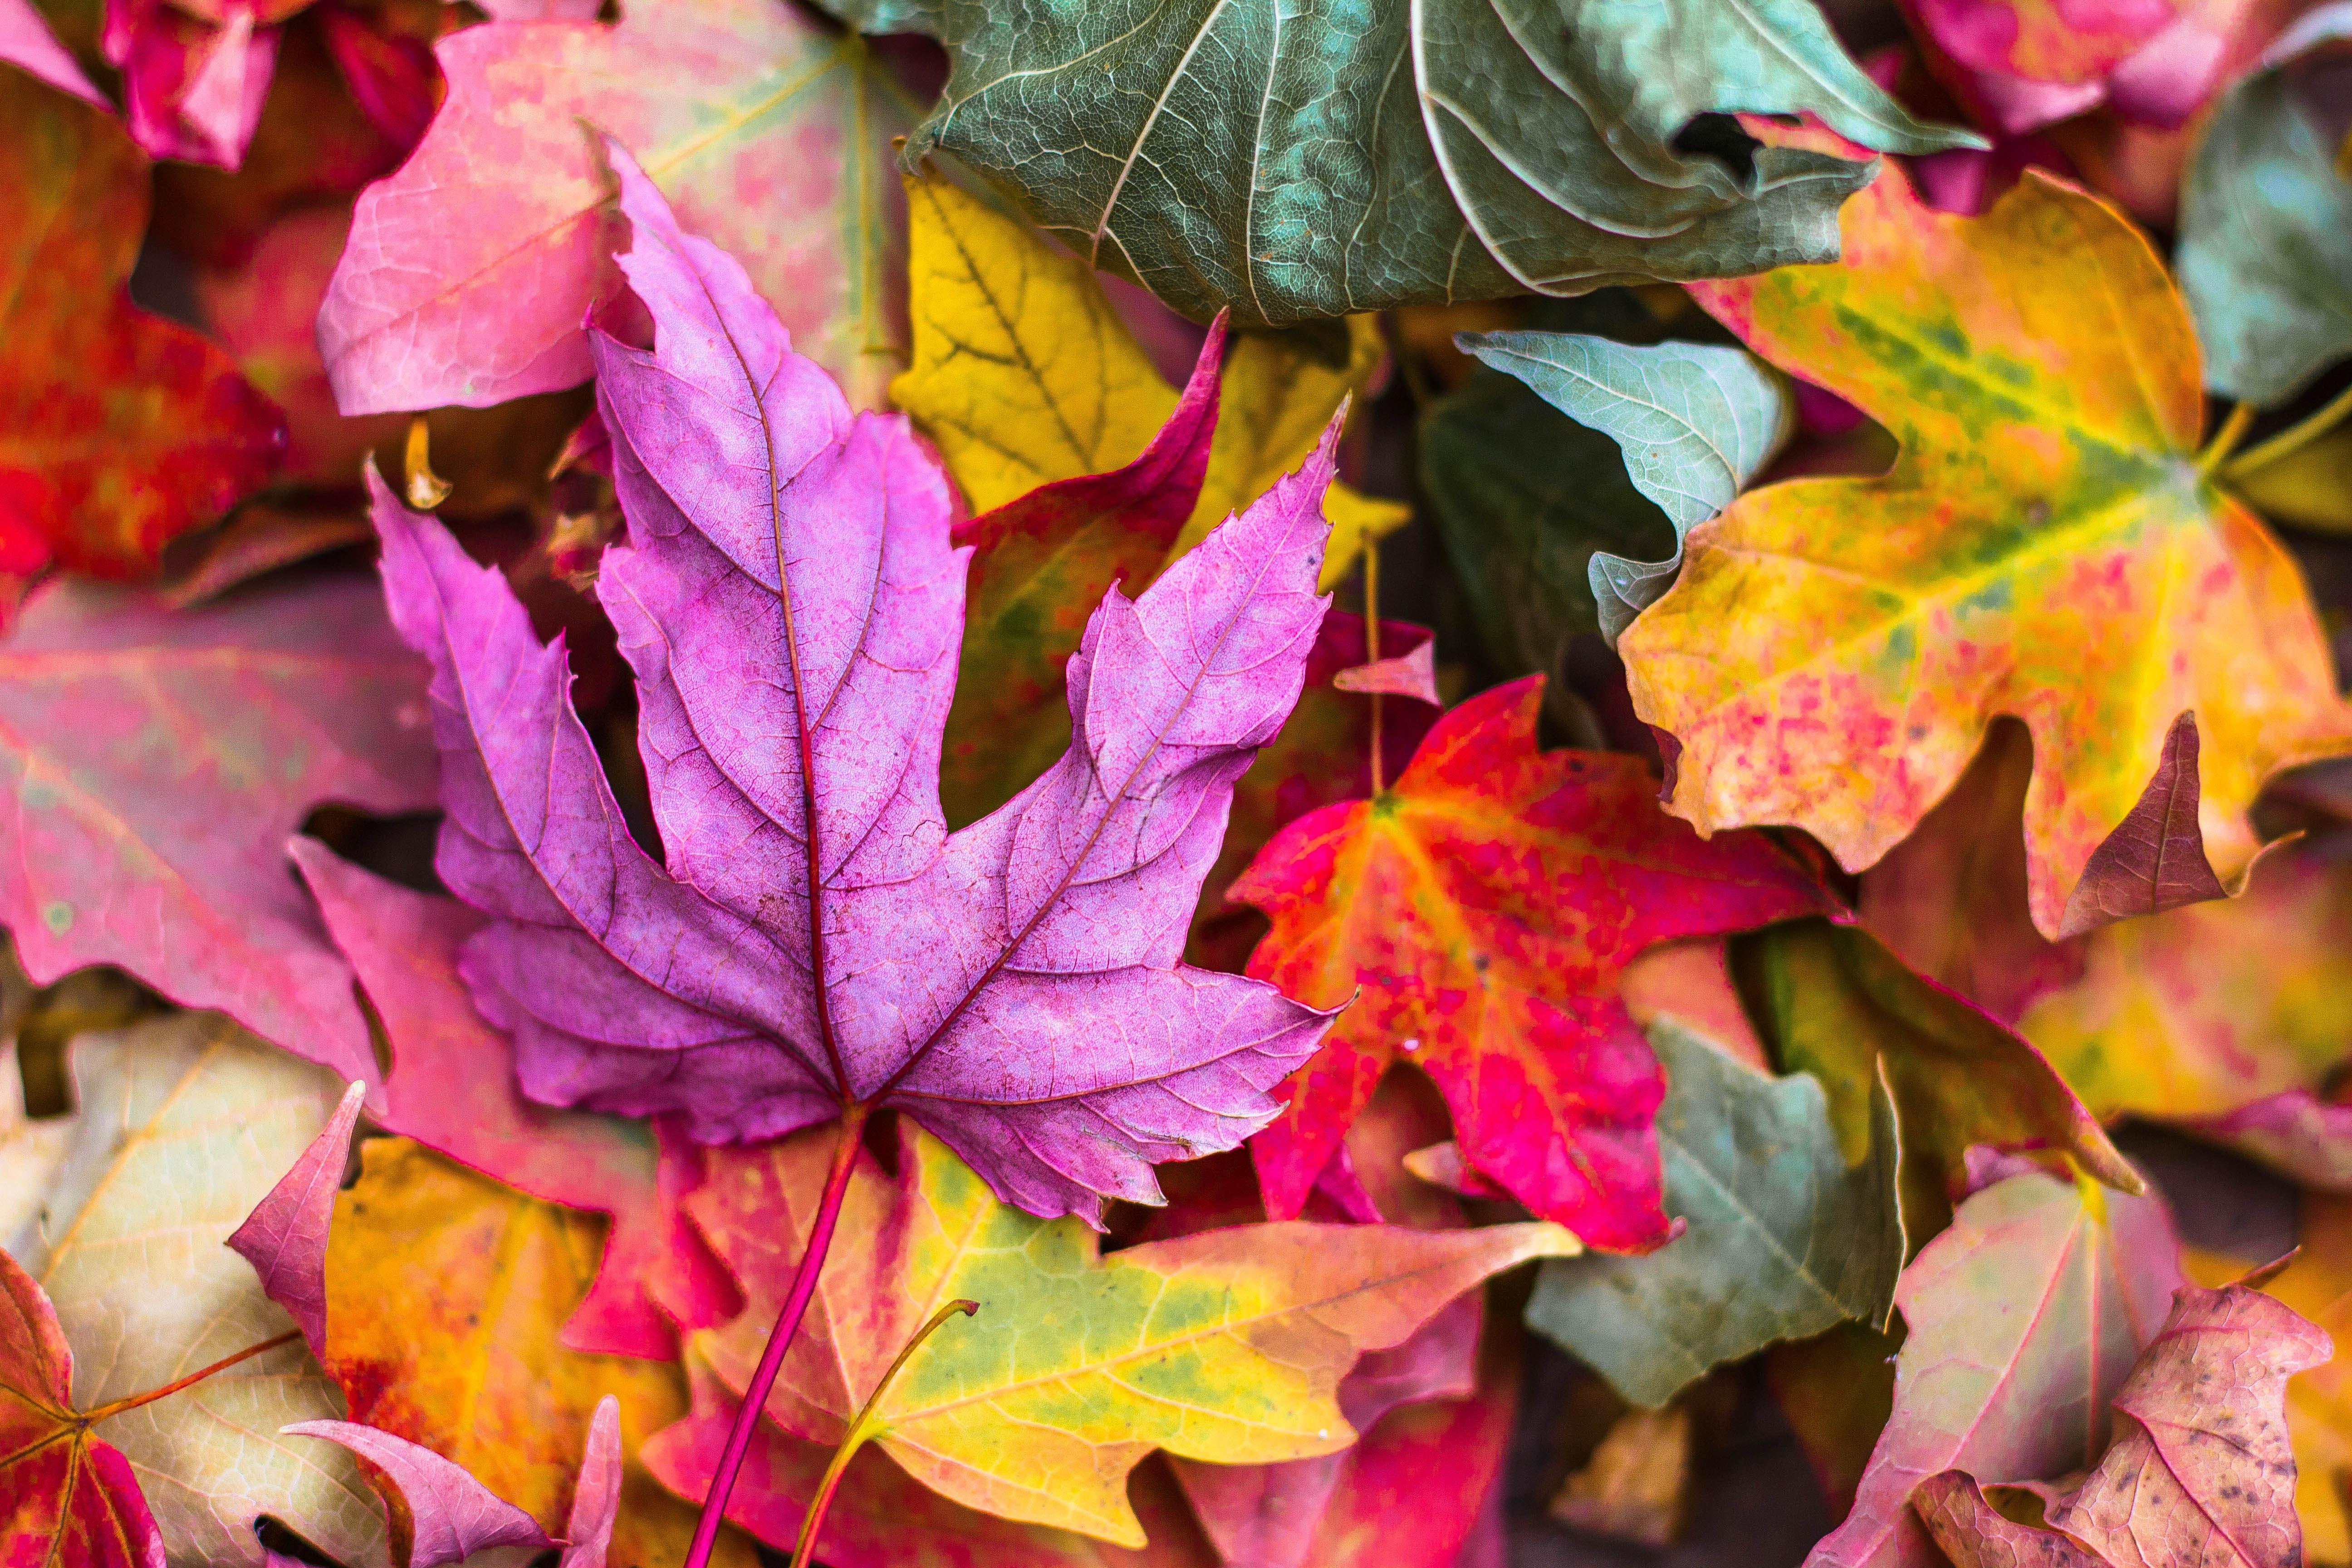 jeremy-thomas-79493-unsplash-autumn-leaves